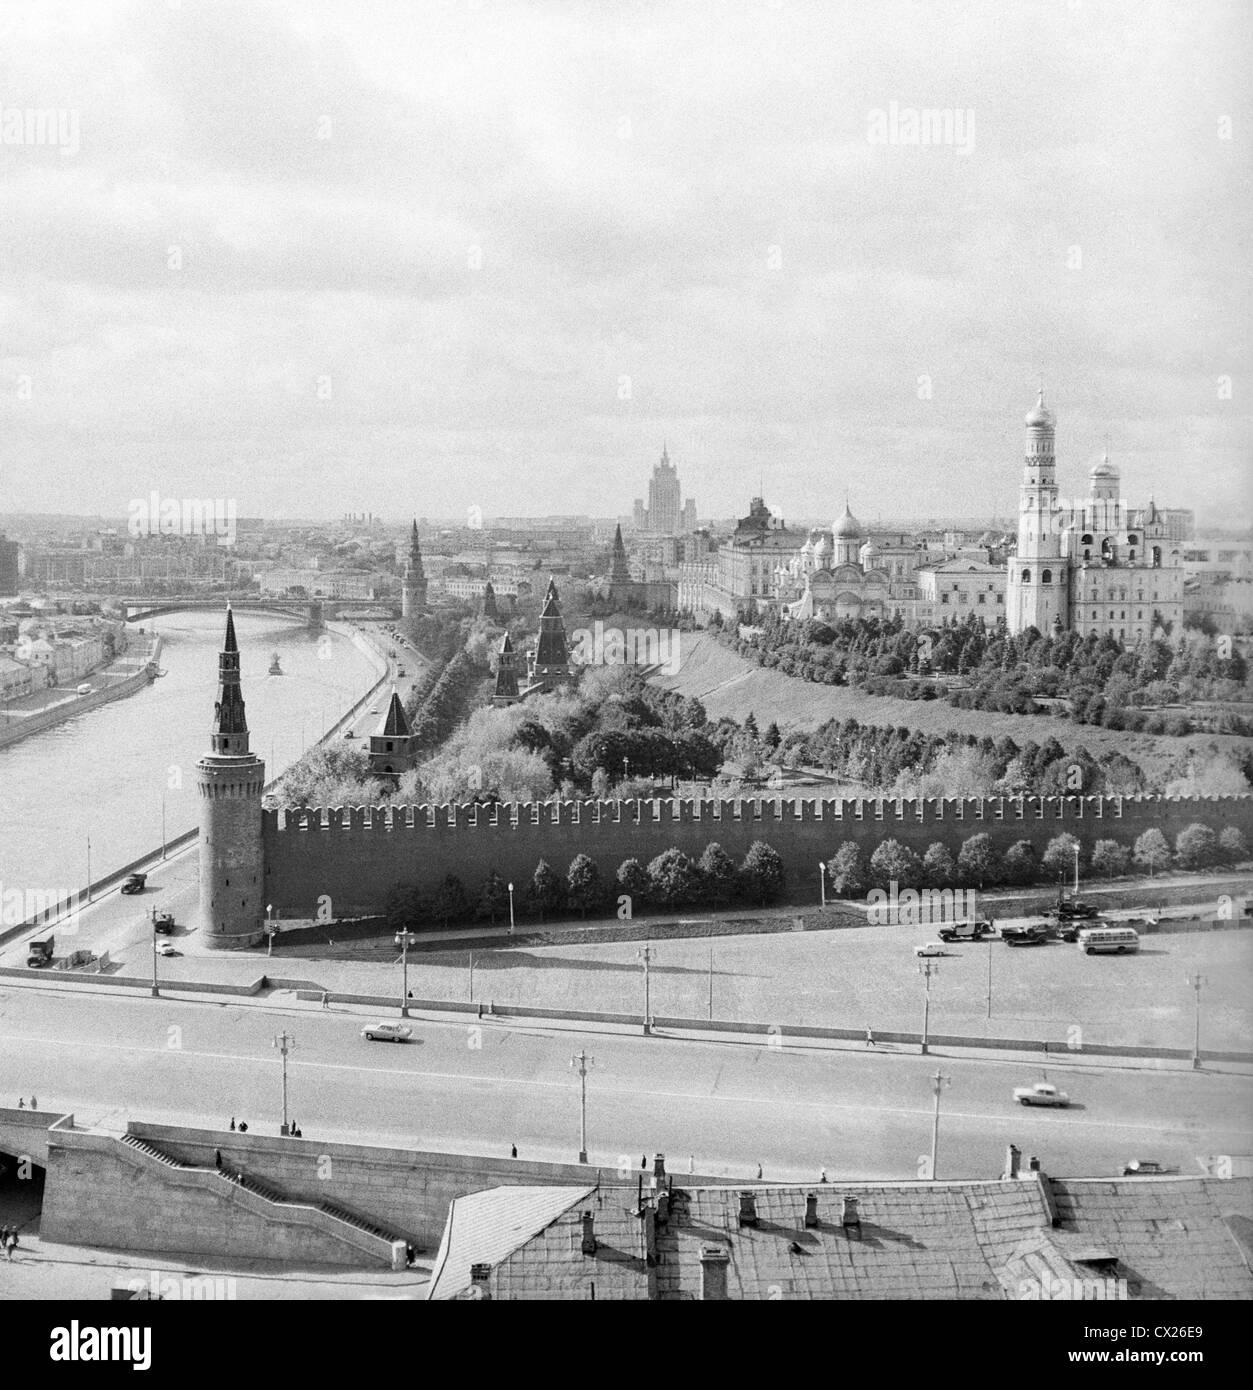 L'agence ITAR-TASS: URSS, Moscou. Une vue sur Vasilyevsky Spusk et Kremlin remblai. (Photo l'agence ITAR-TASS / Banque D'Images